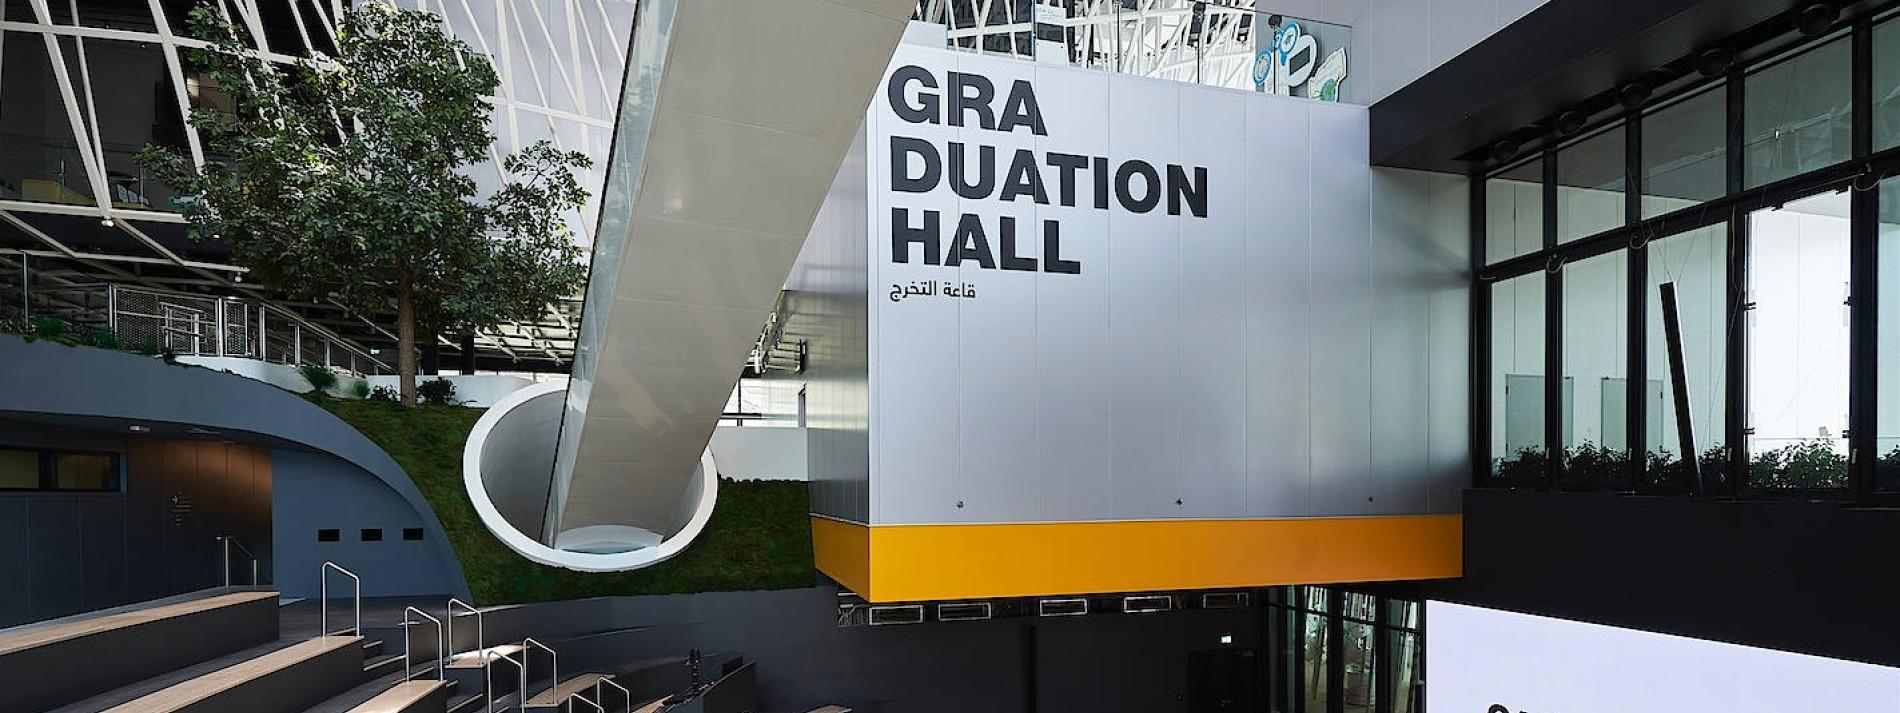 Hessens großer Expo-Auftritt in Dubai